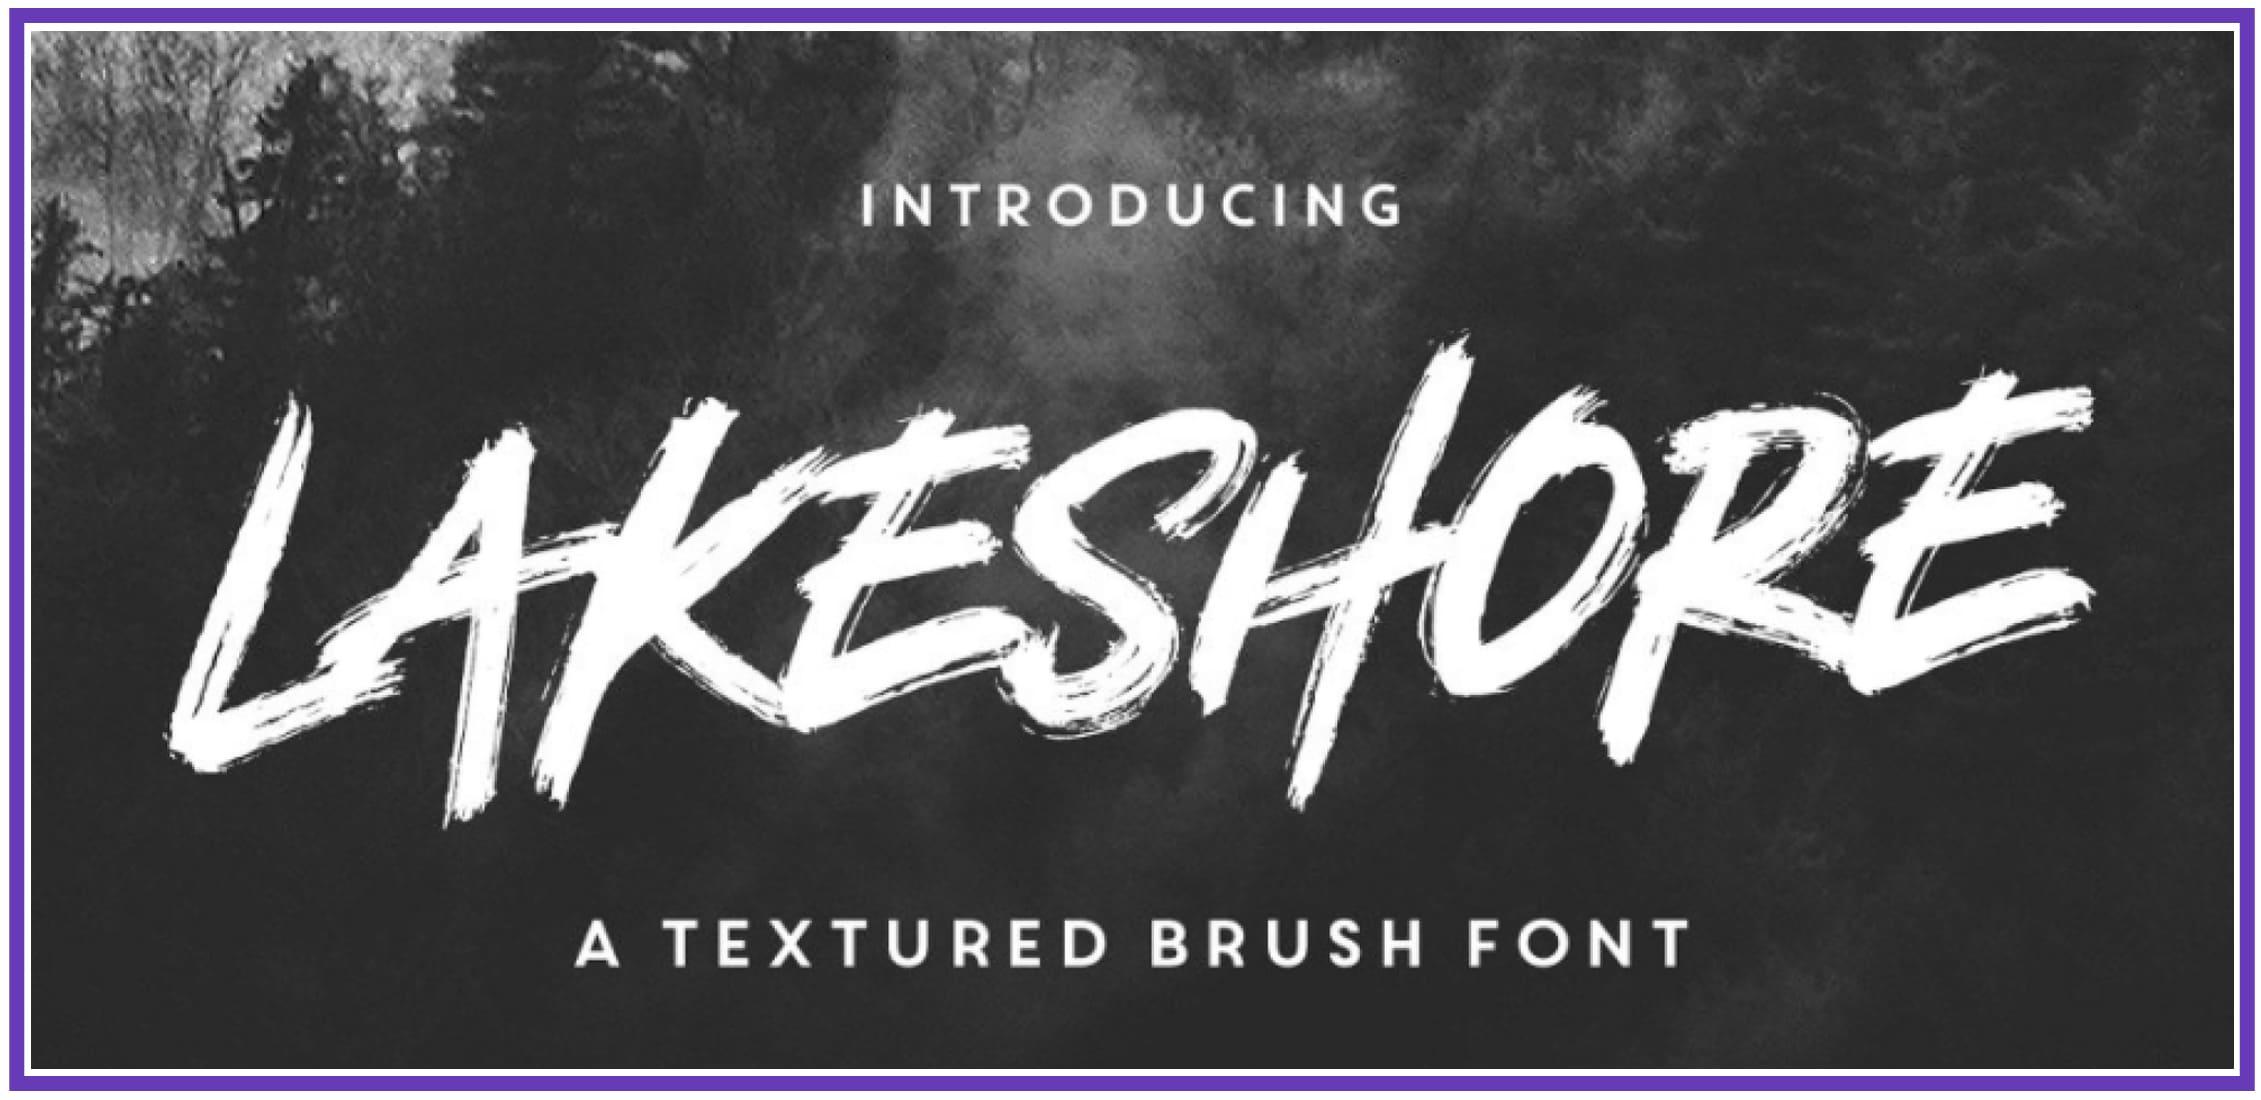 Eye-catching Lakeshore. Punk Font.